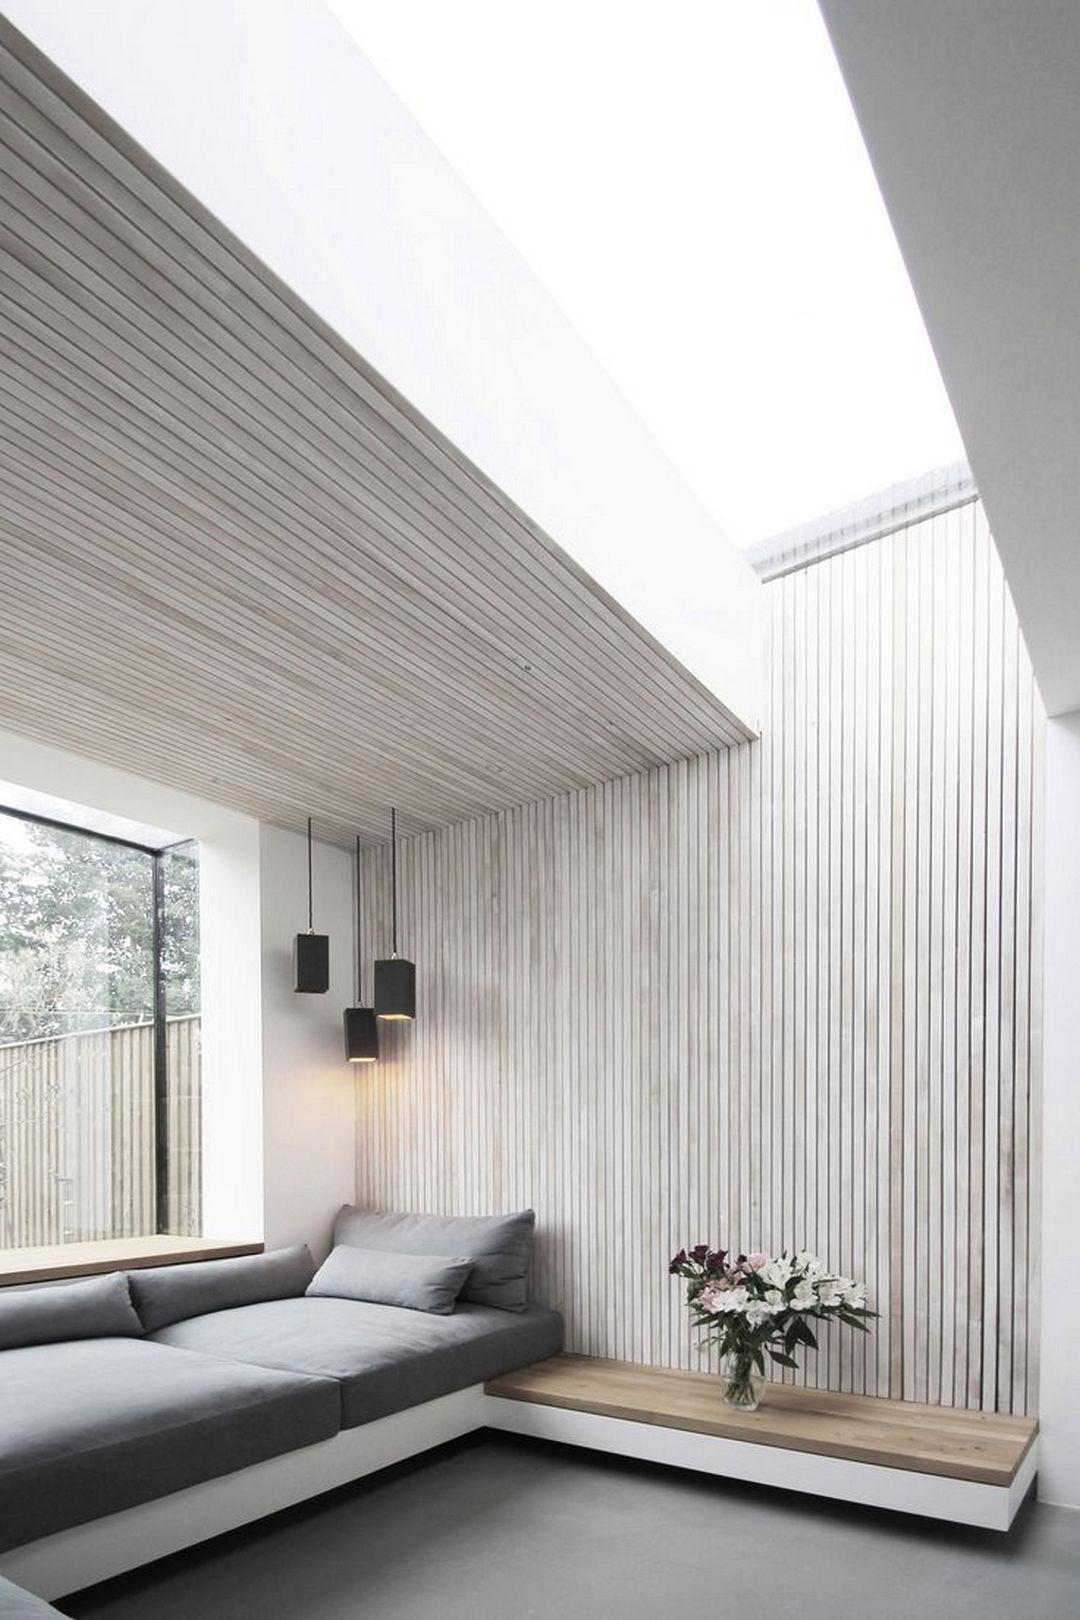 64 Sleek Modern Interior Decorating Ideas |